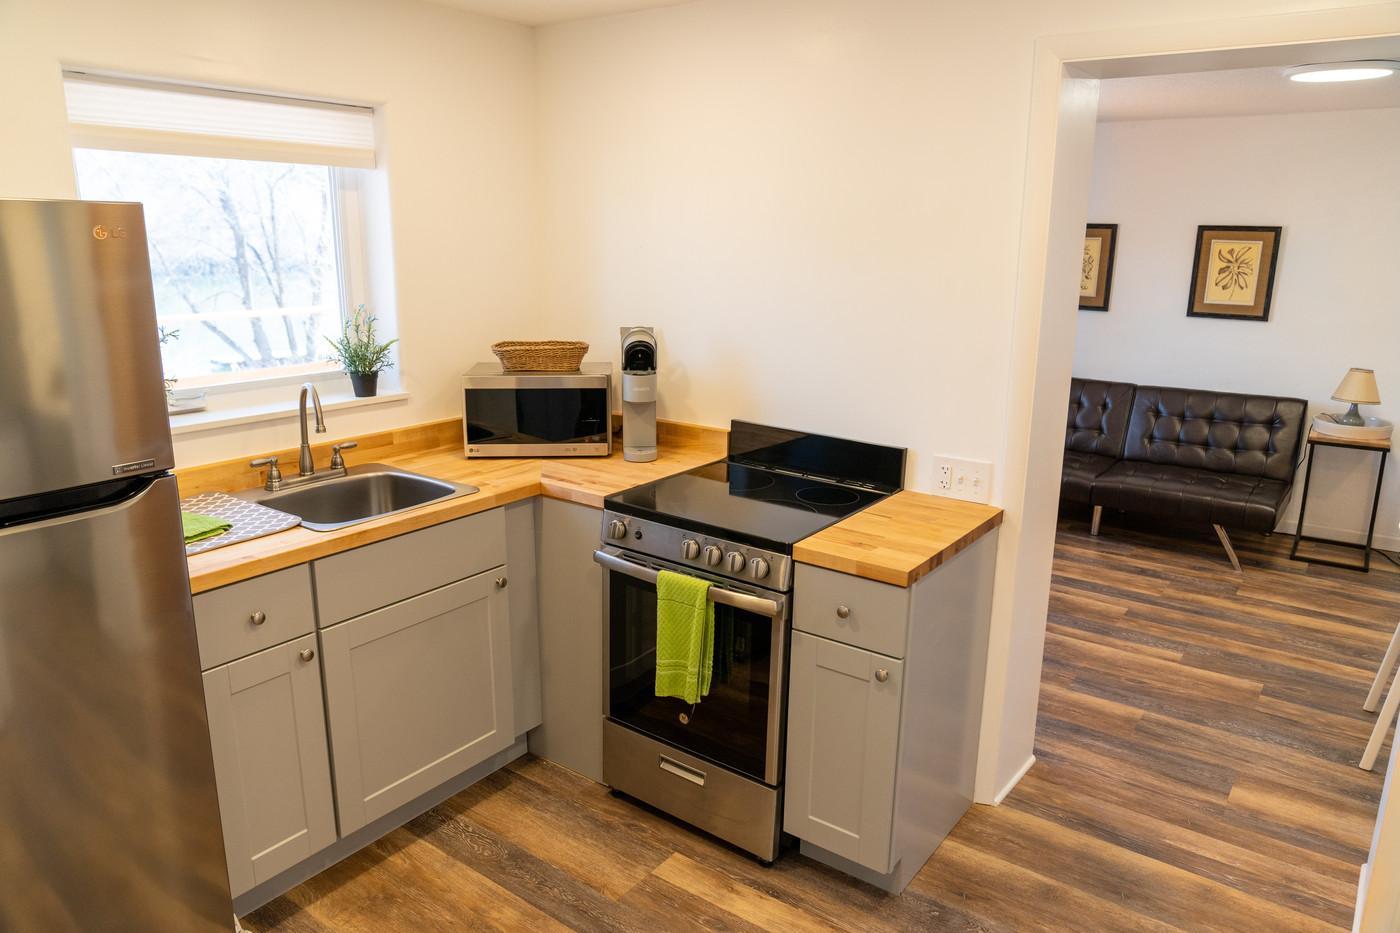 Riverside Condo Kitchen